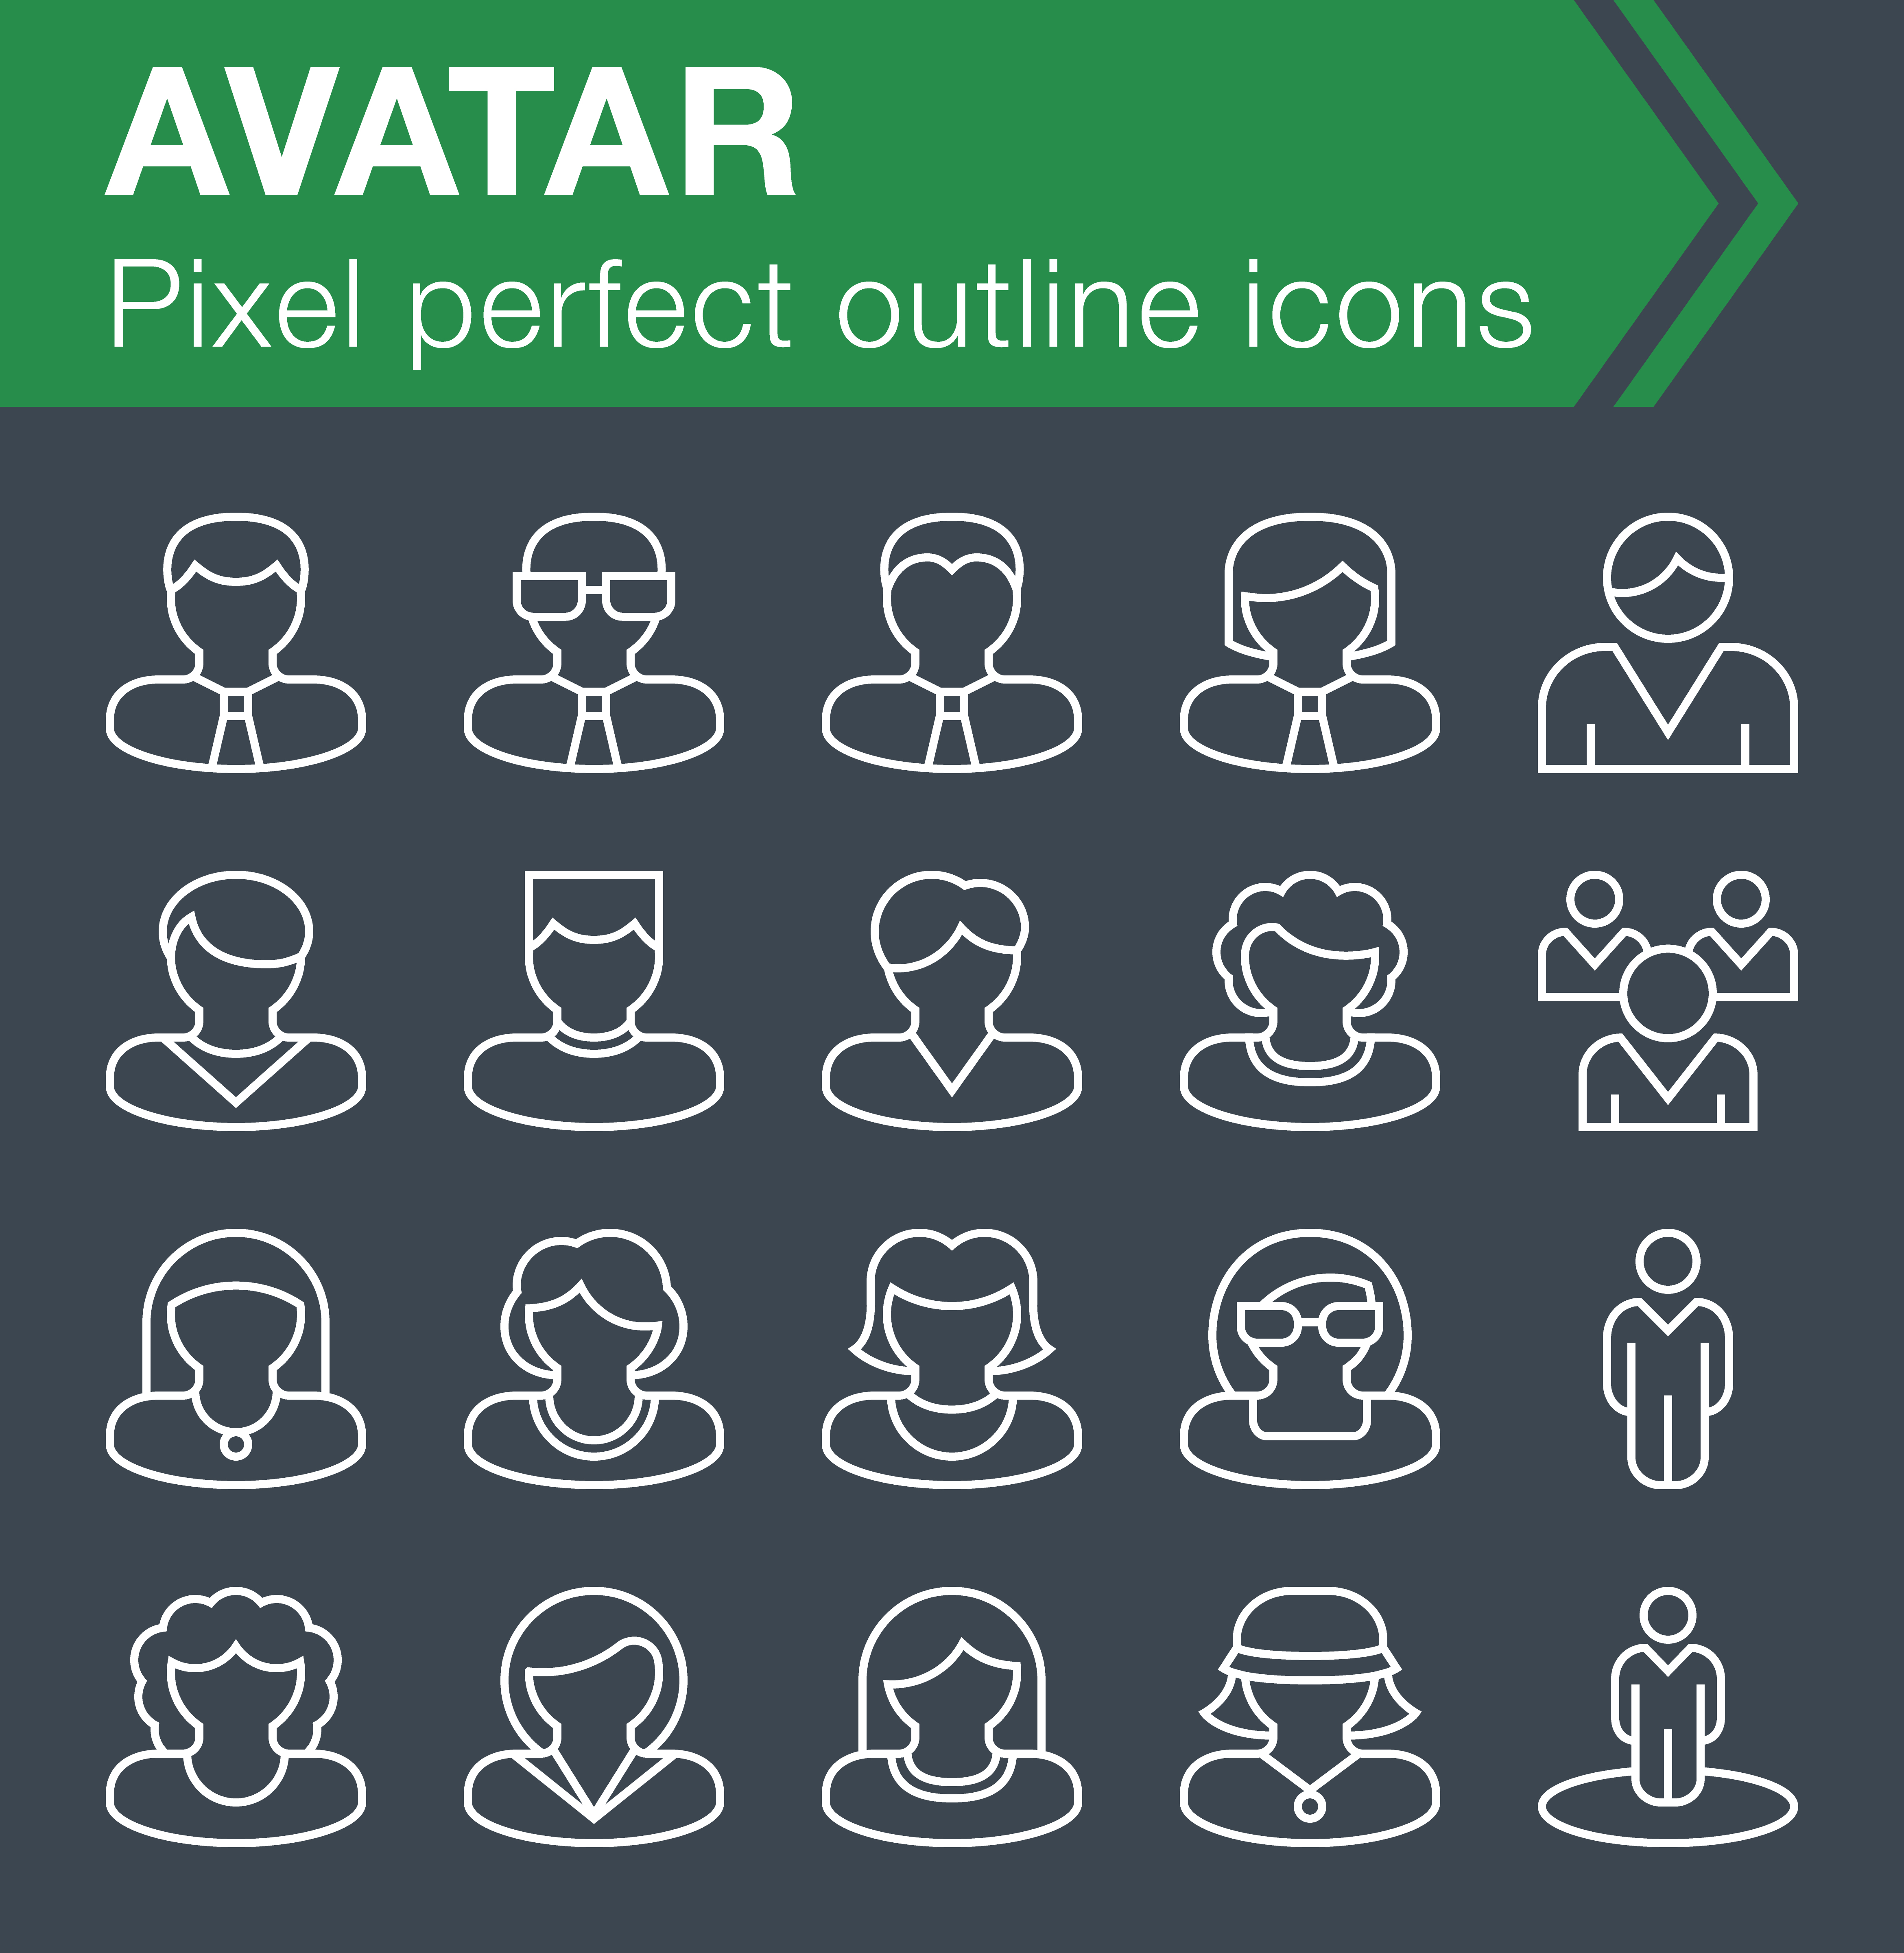 Avatar outline icons set